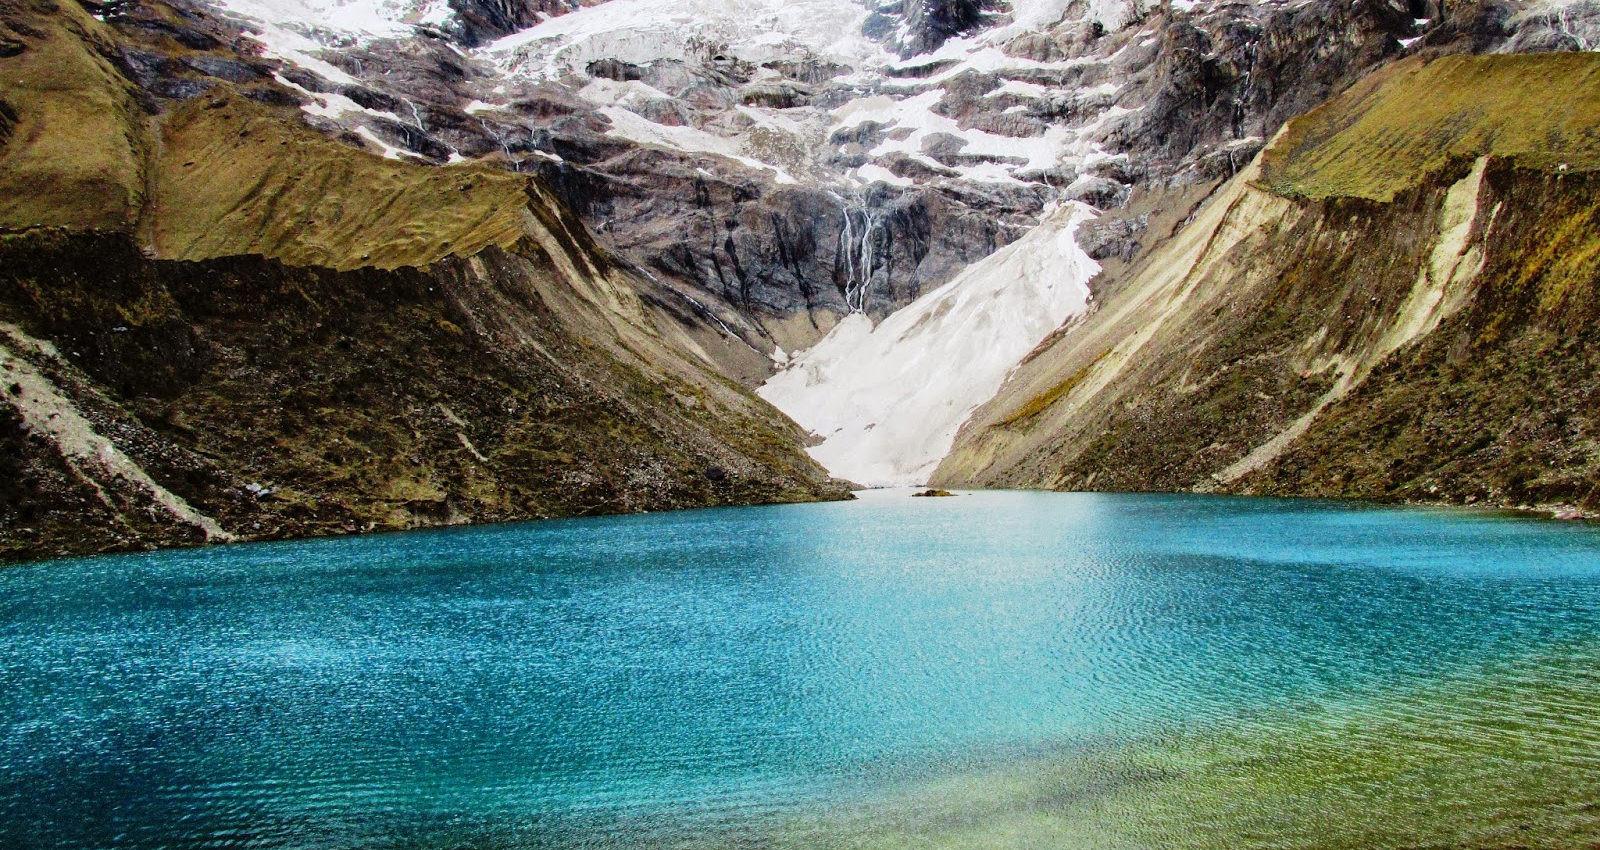 Humanatay Lake